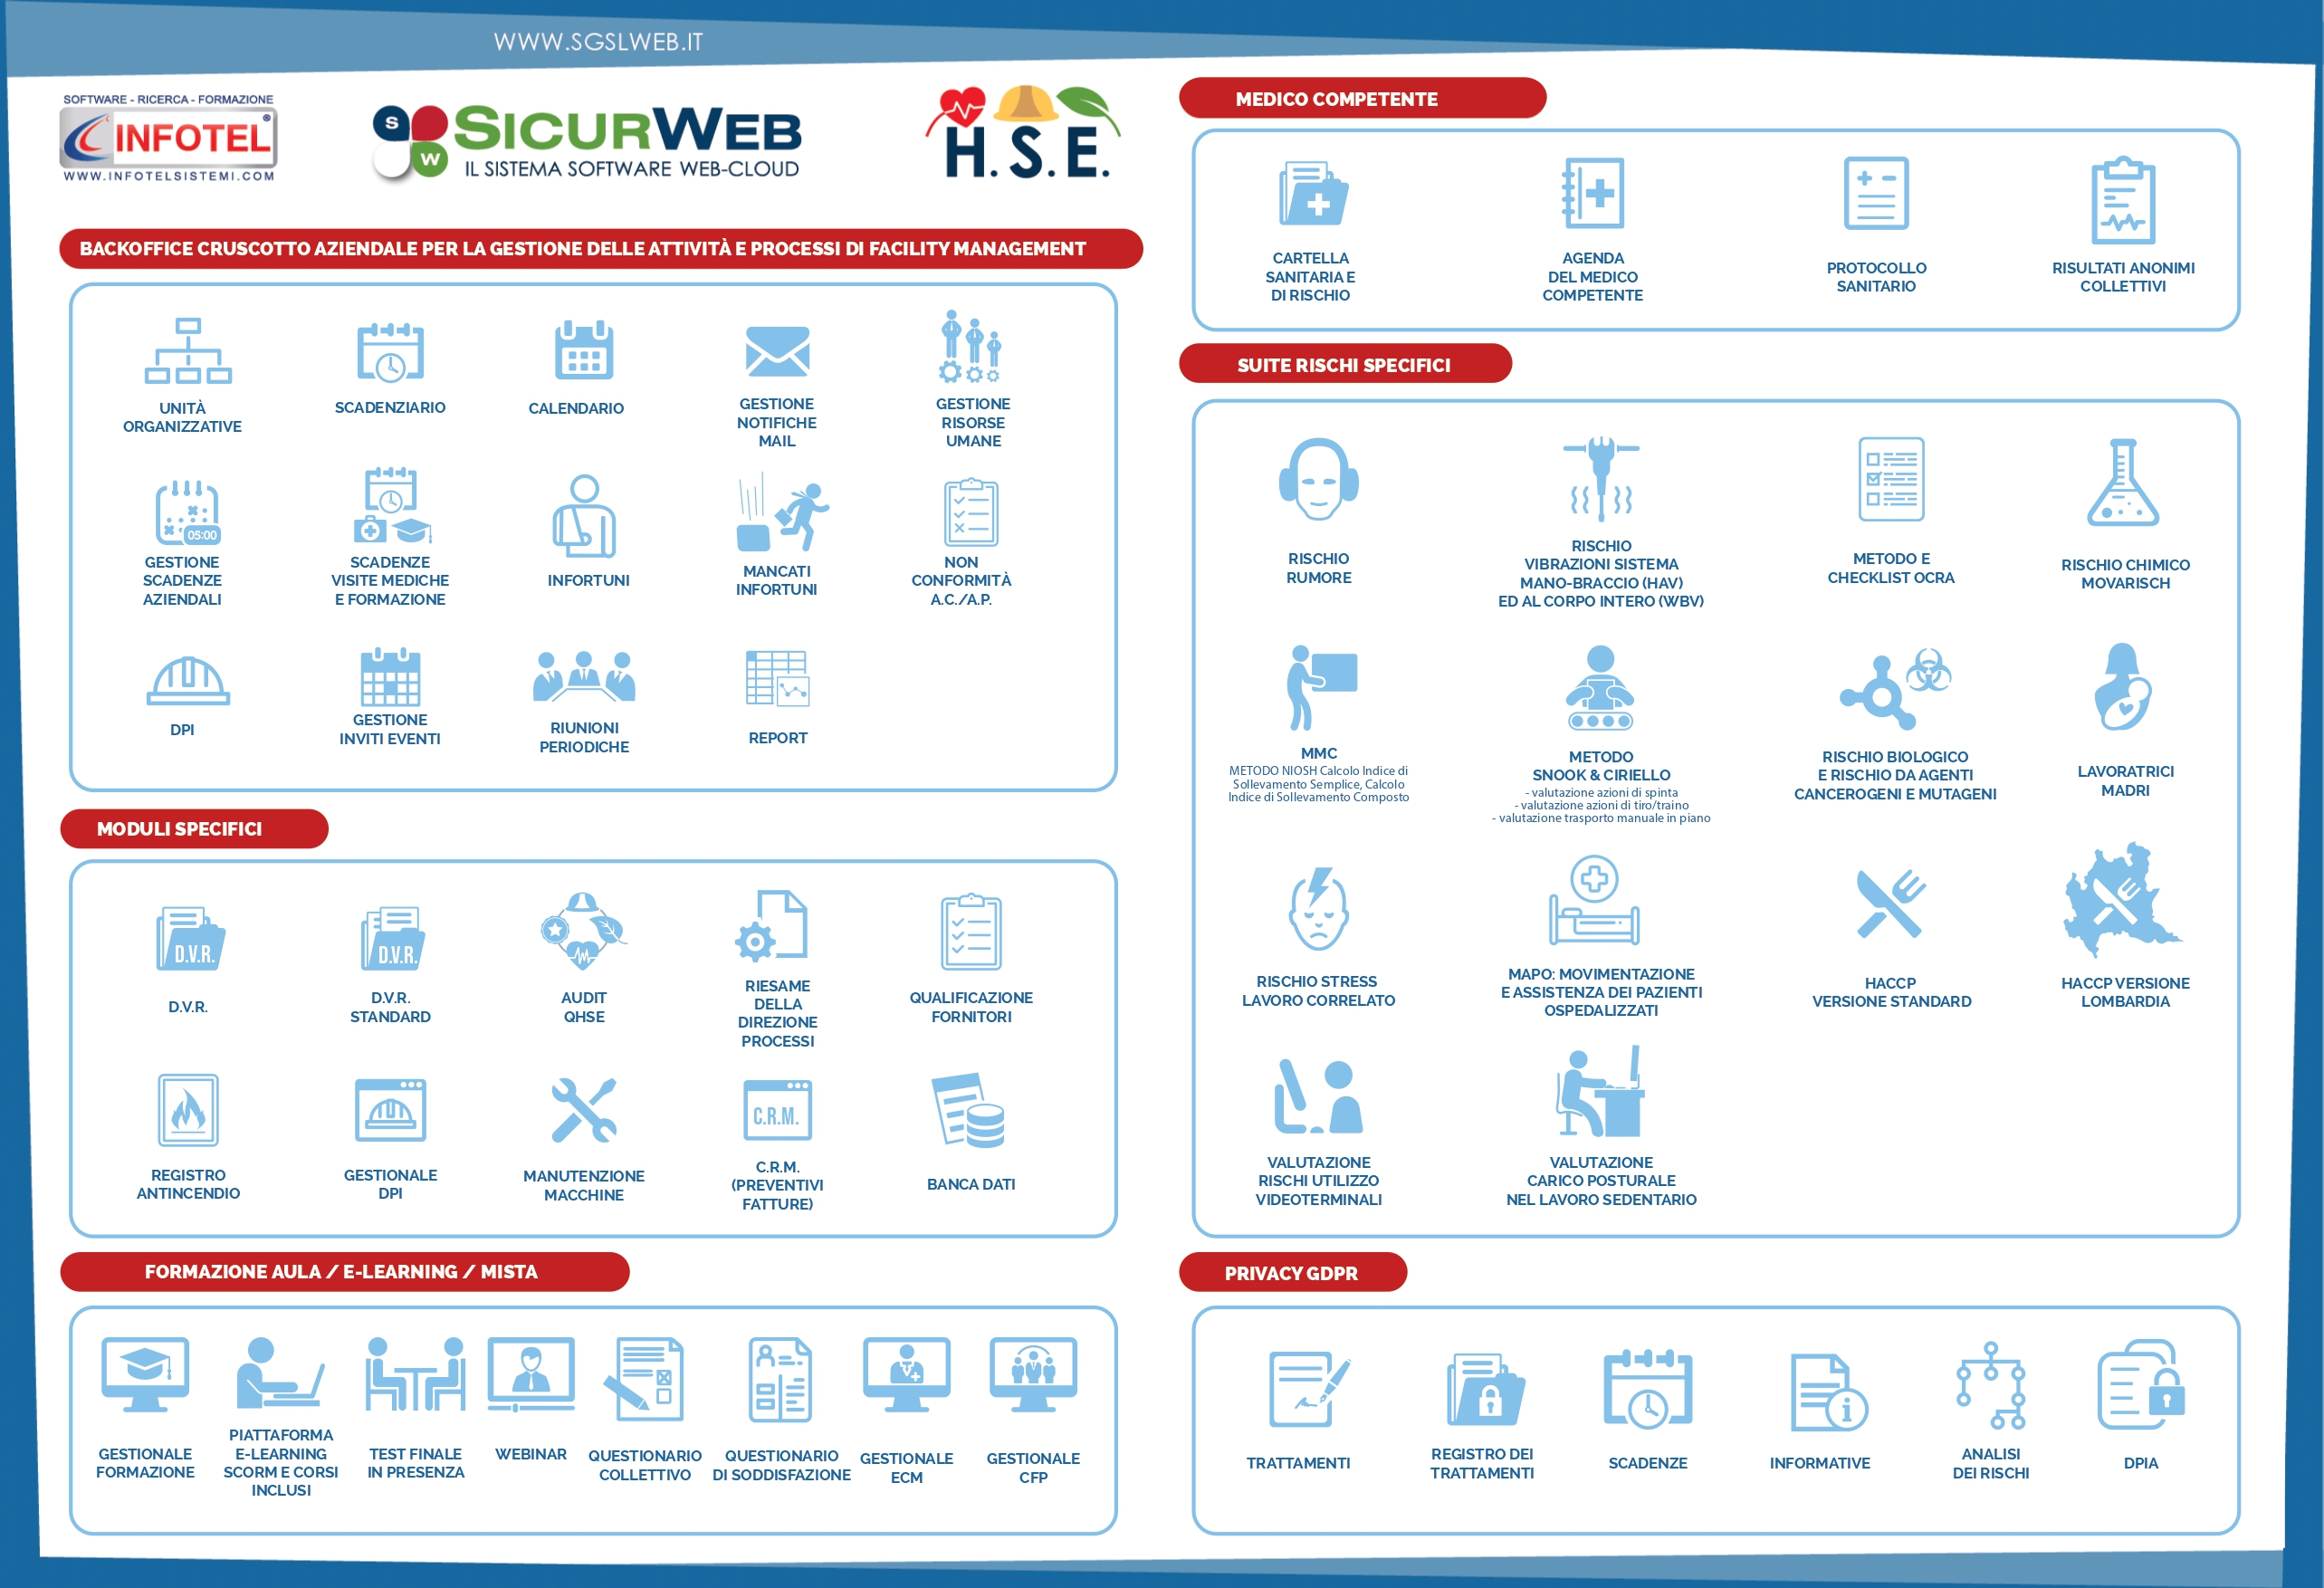 sicurweb sistema software web